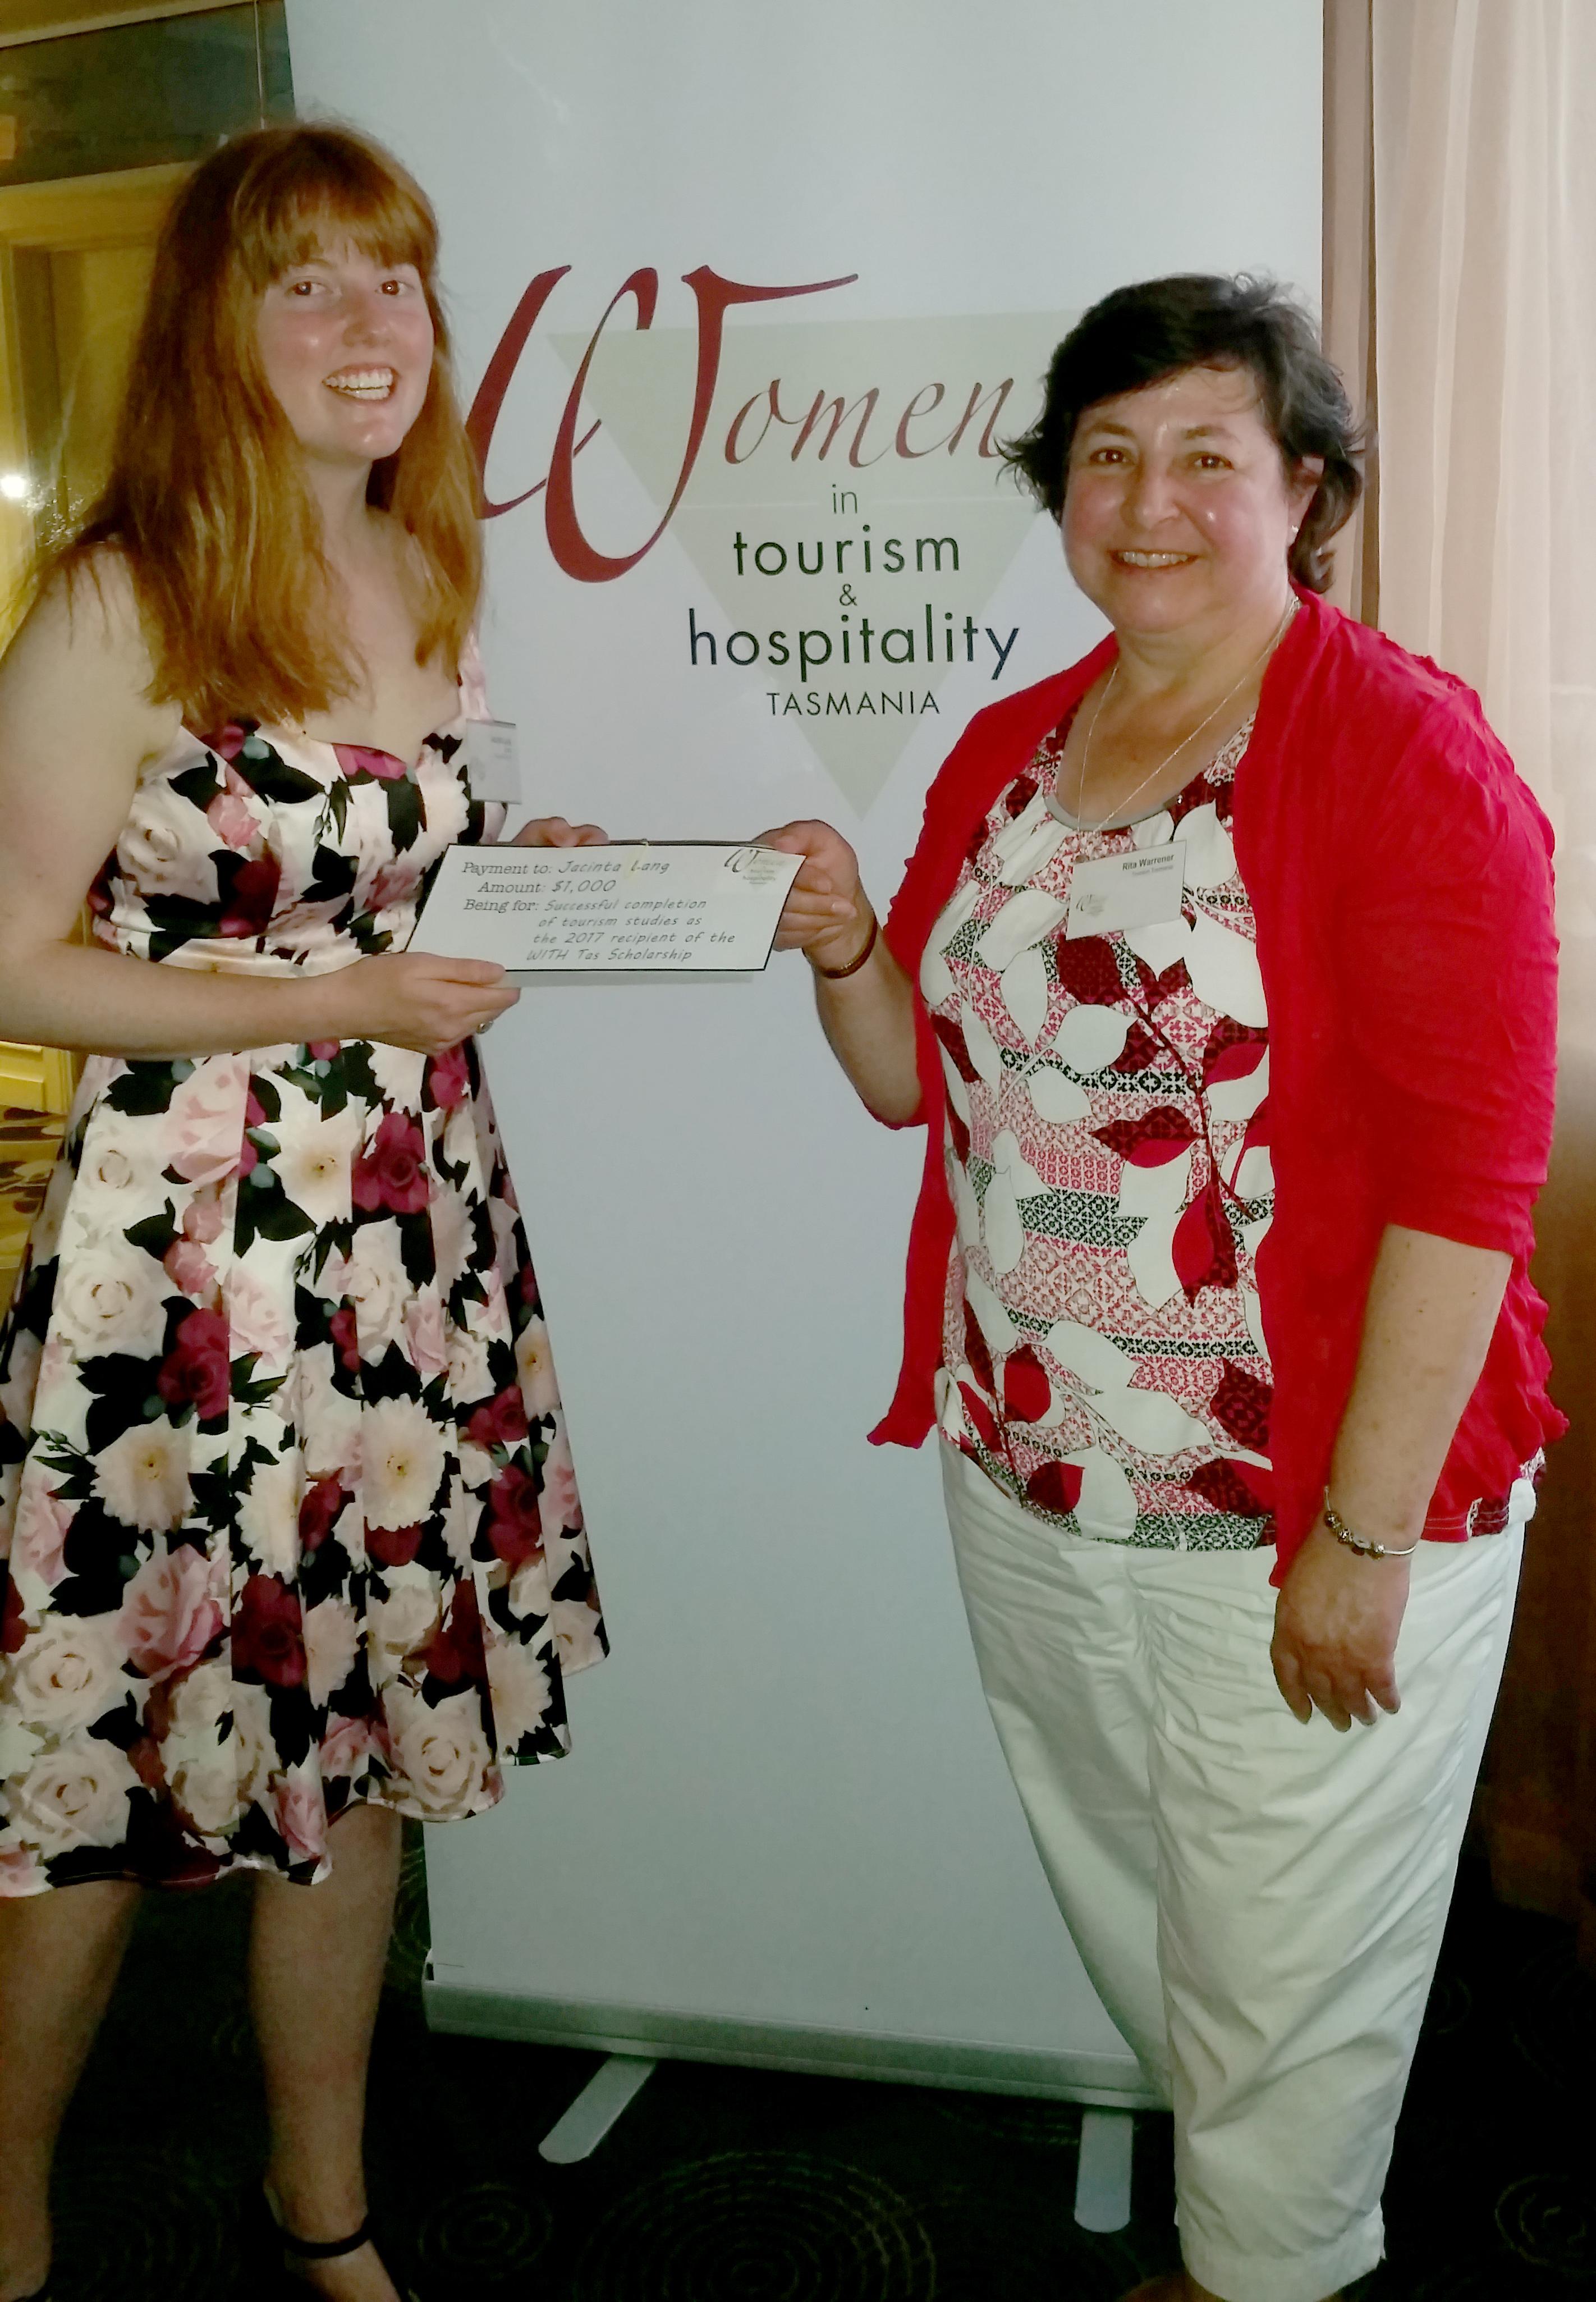 2018 Scholarship recipient Jacinta Long and Rita Warrener of WITH Tas